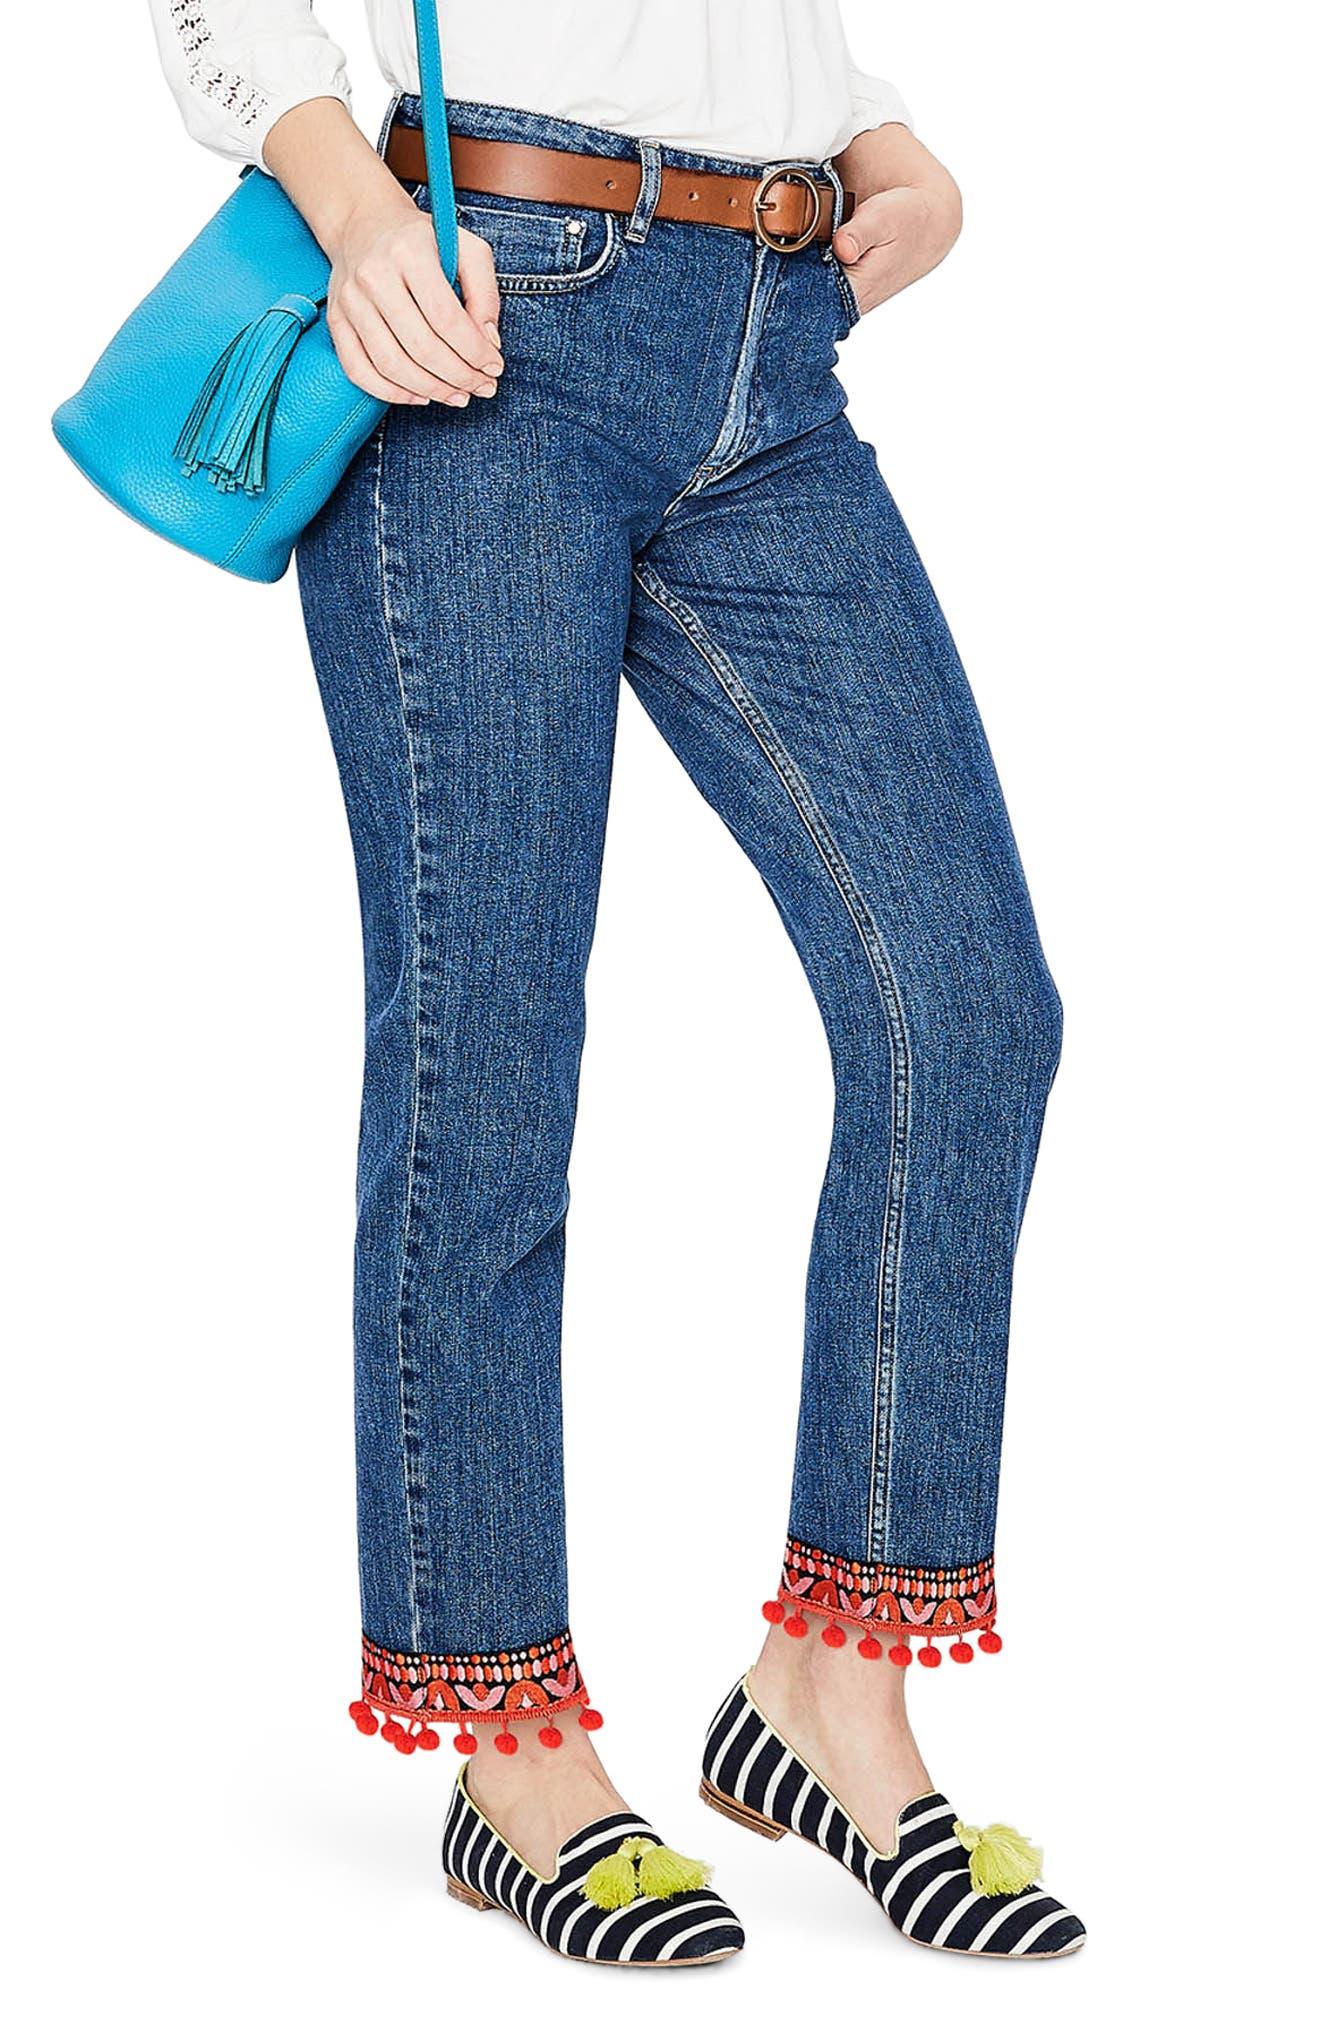 Cambridge Embellished Ankle Skimmer Jeans,                         Main,                         color, Mid Vintage With Tri